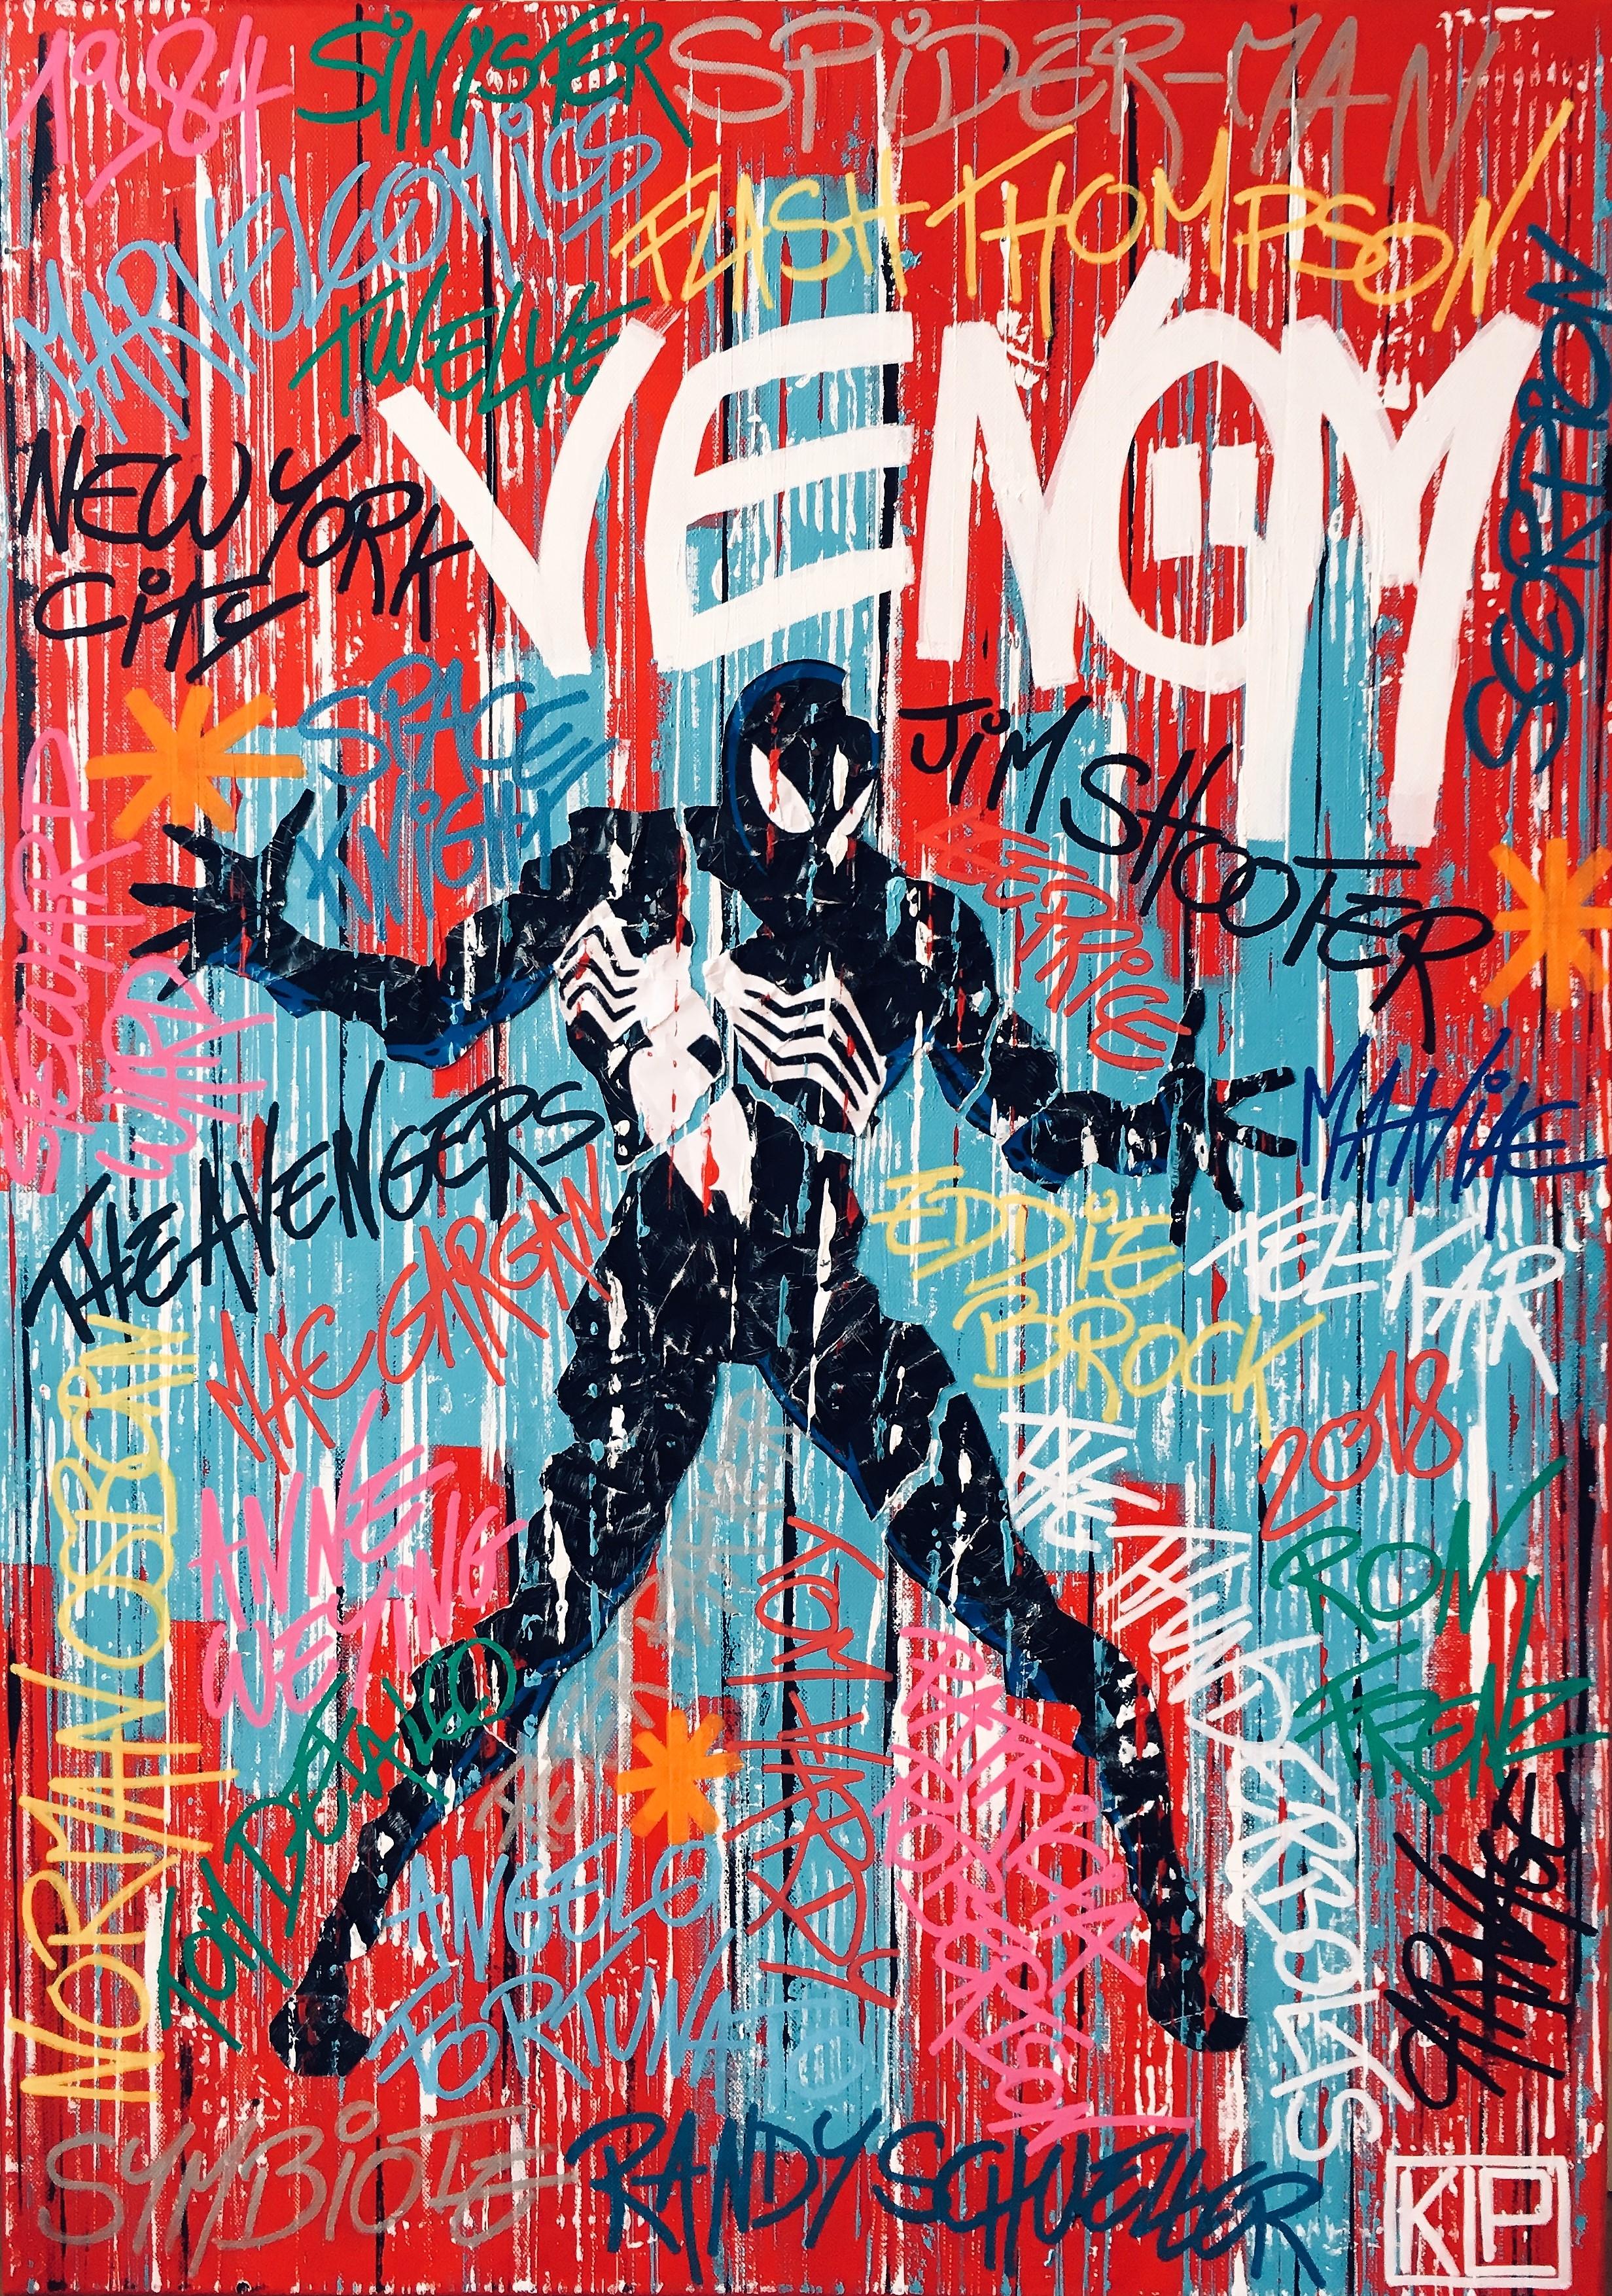 Toile 28_Superheroes #9_Venom_2018.JPG